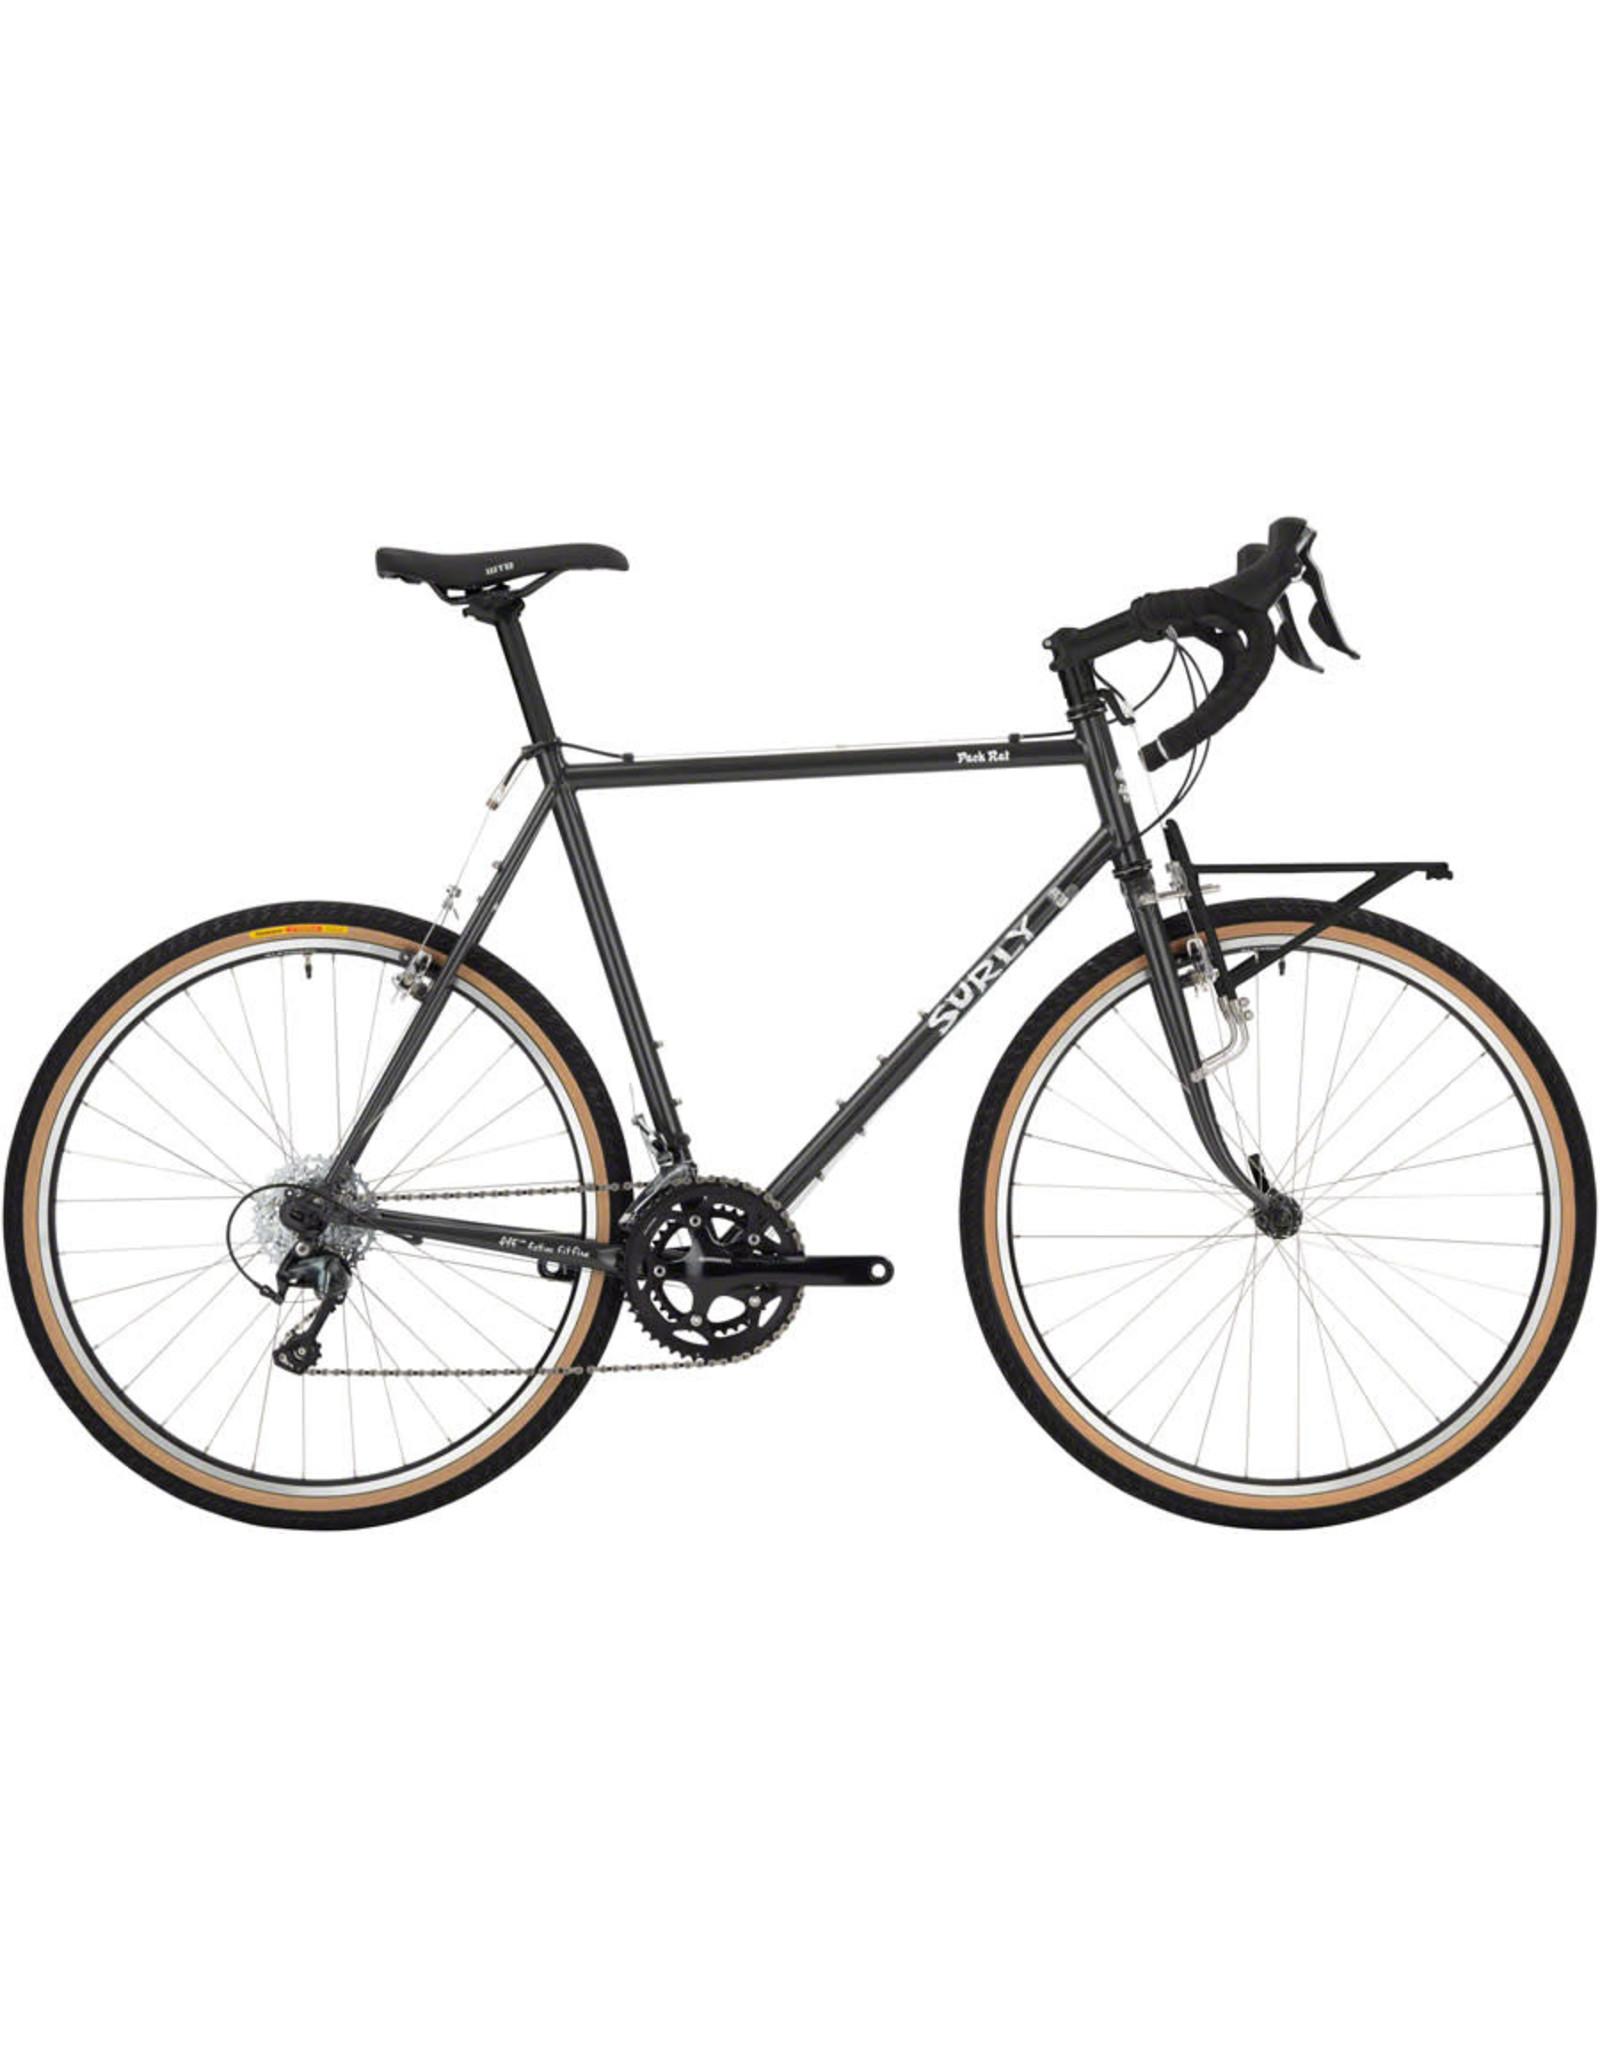 Surly Surly Pack Rat 650b Bike - Steel